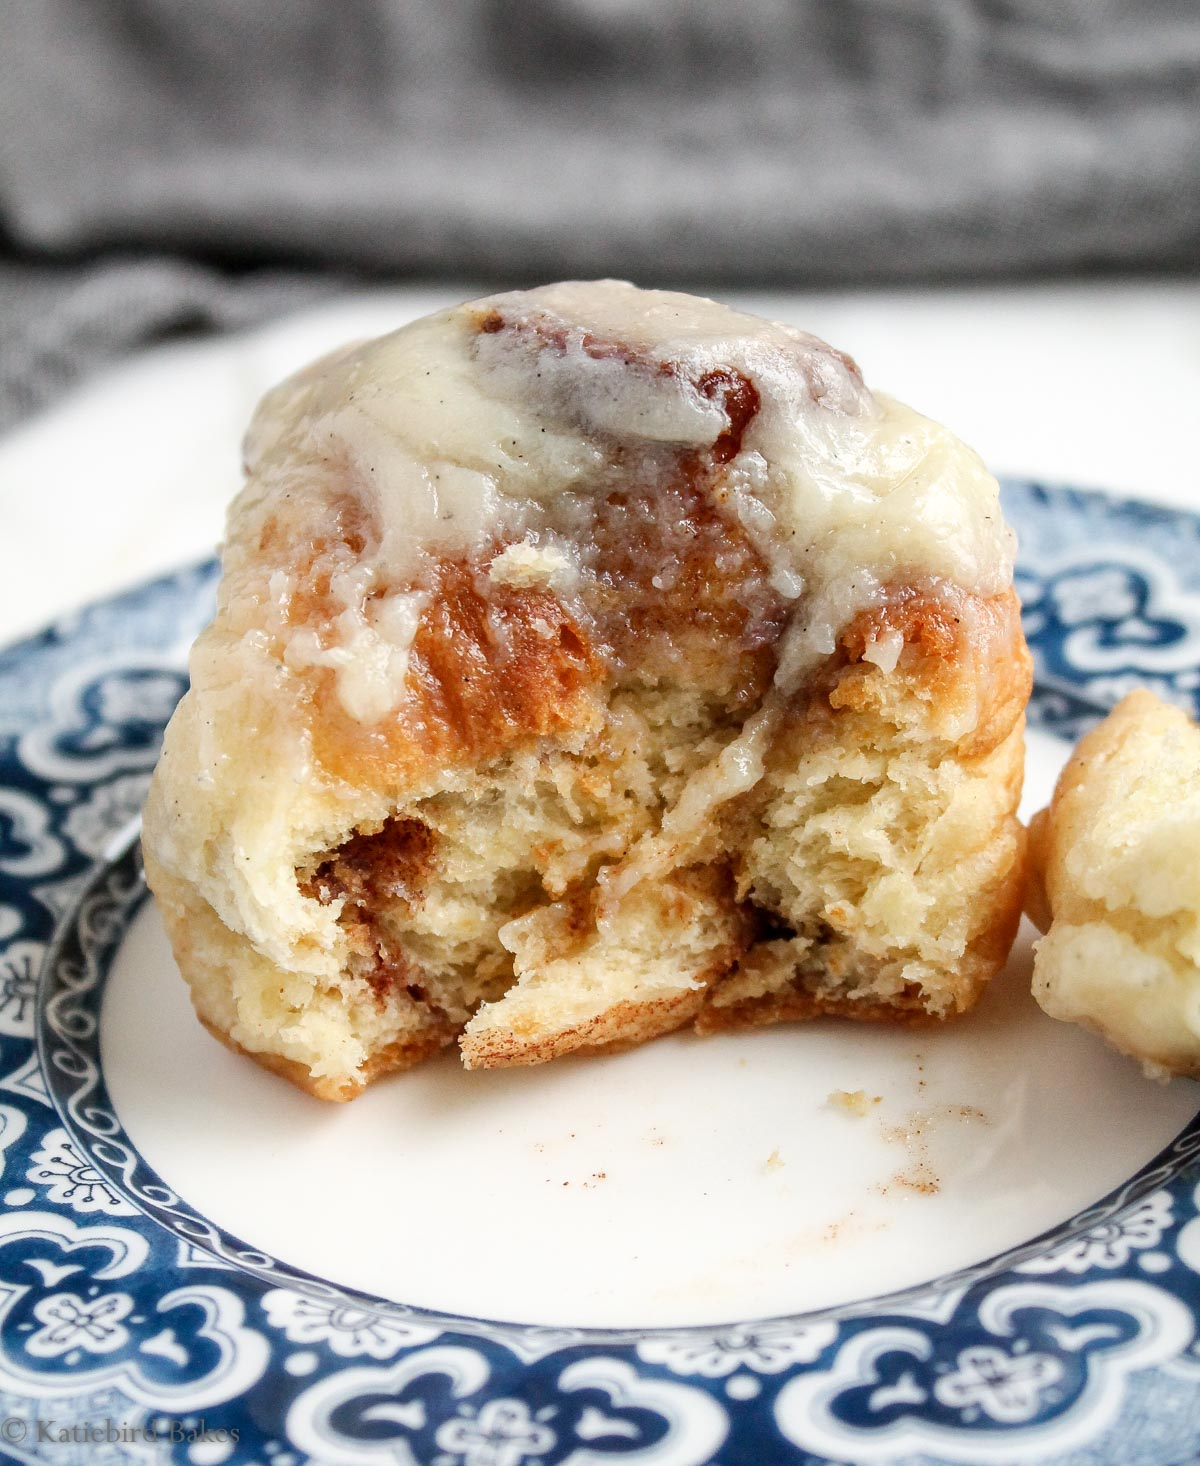 Cinnamon Rolls with Cream Cheese Icing - katiebirdbakes.com